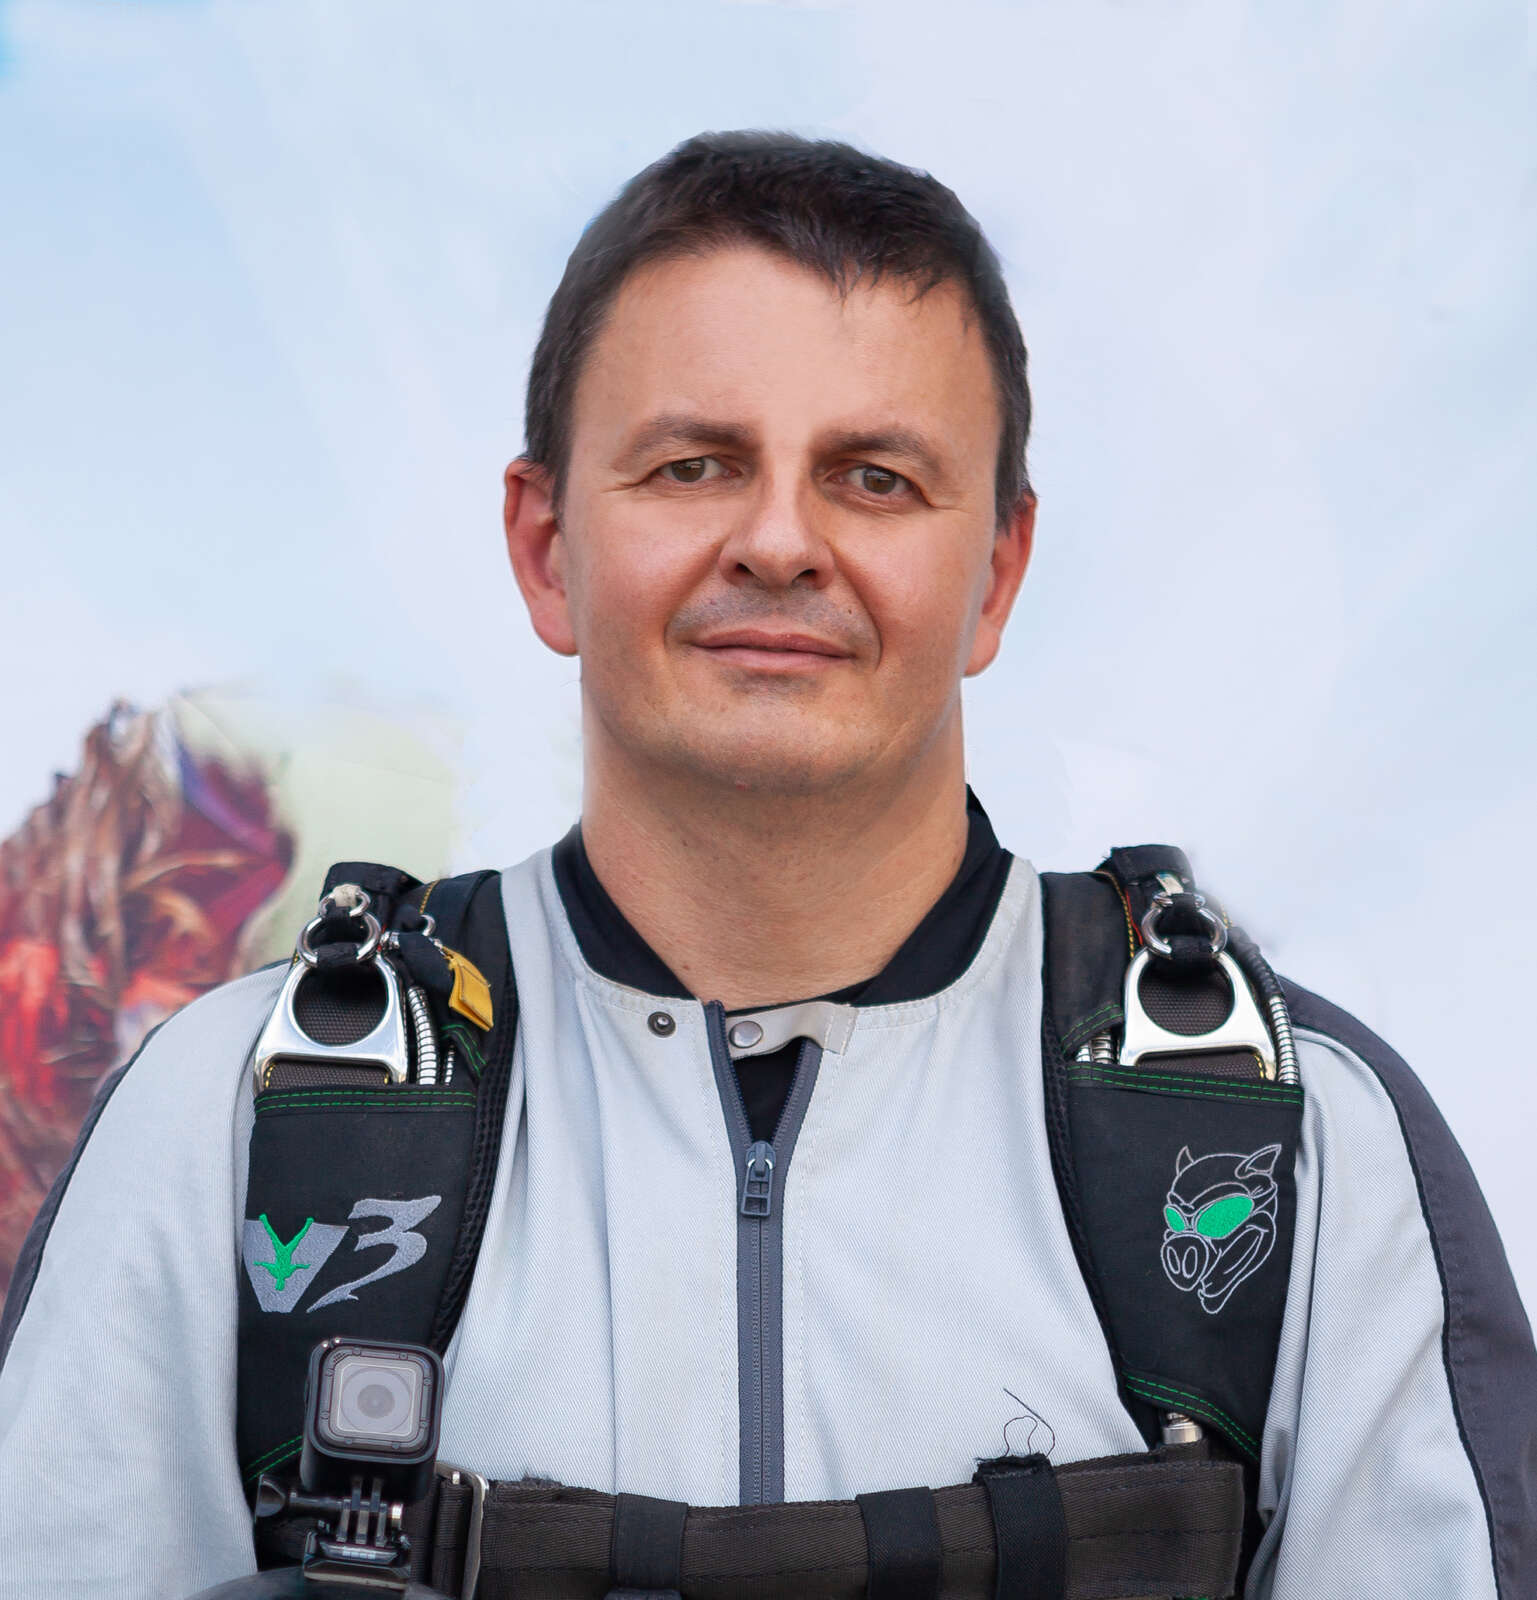 Дмитрий Грибиник - Тандем-инструктор - Skydive Academy